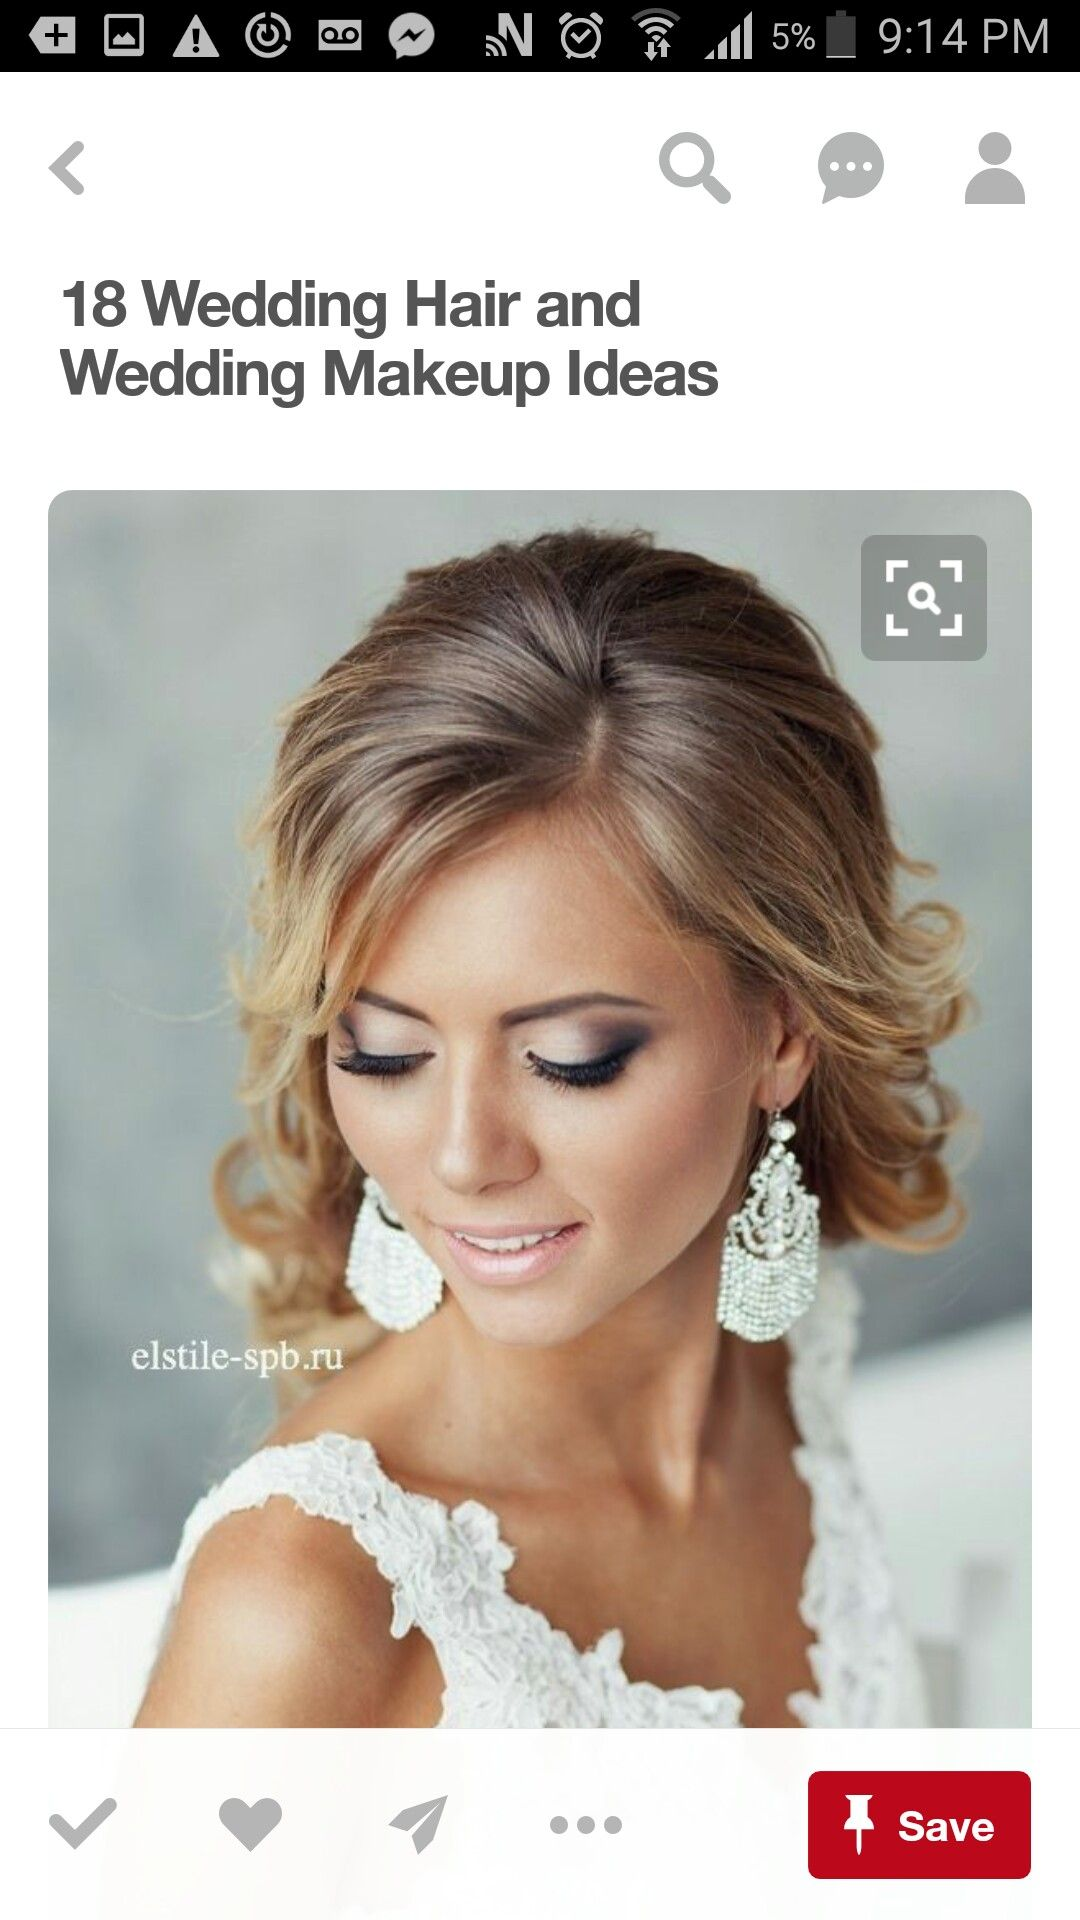 Pin by Nicole Battistel on wedding makeup  Pinterest  Wedding make